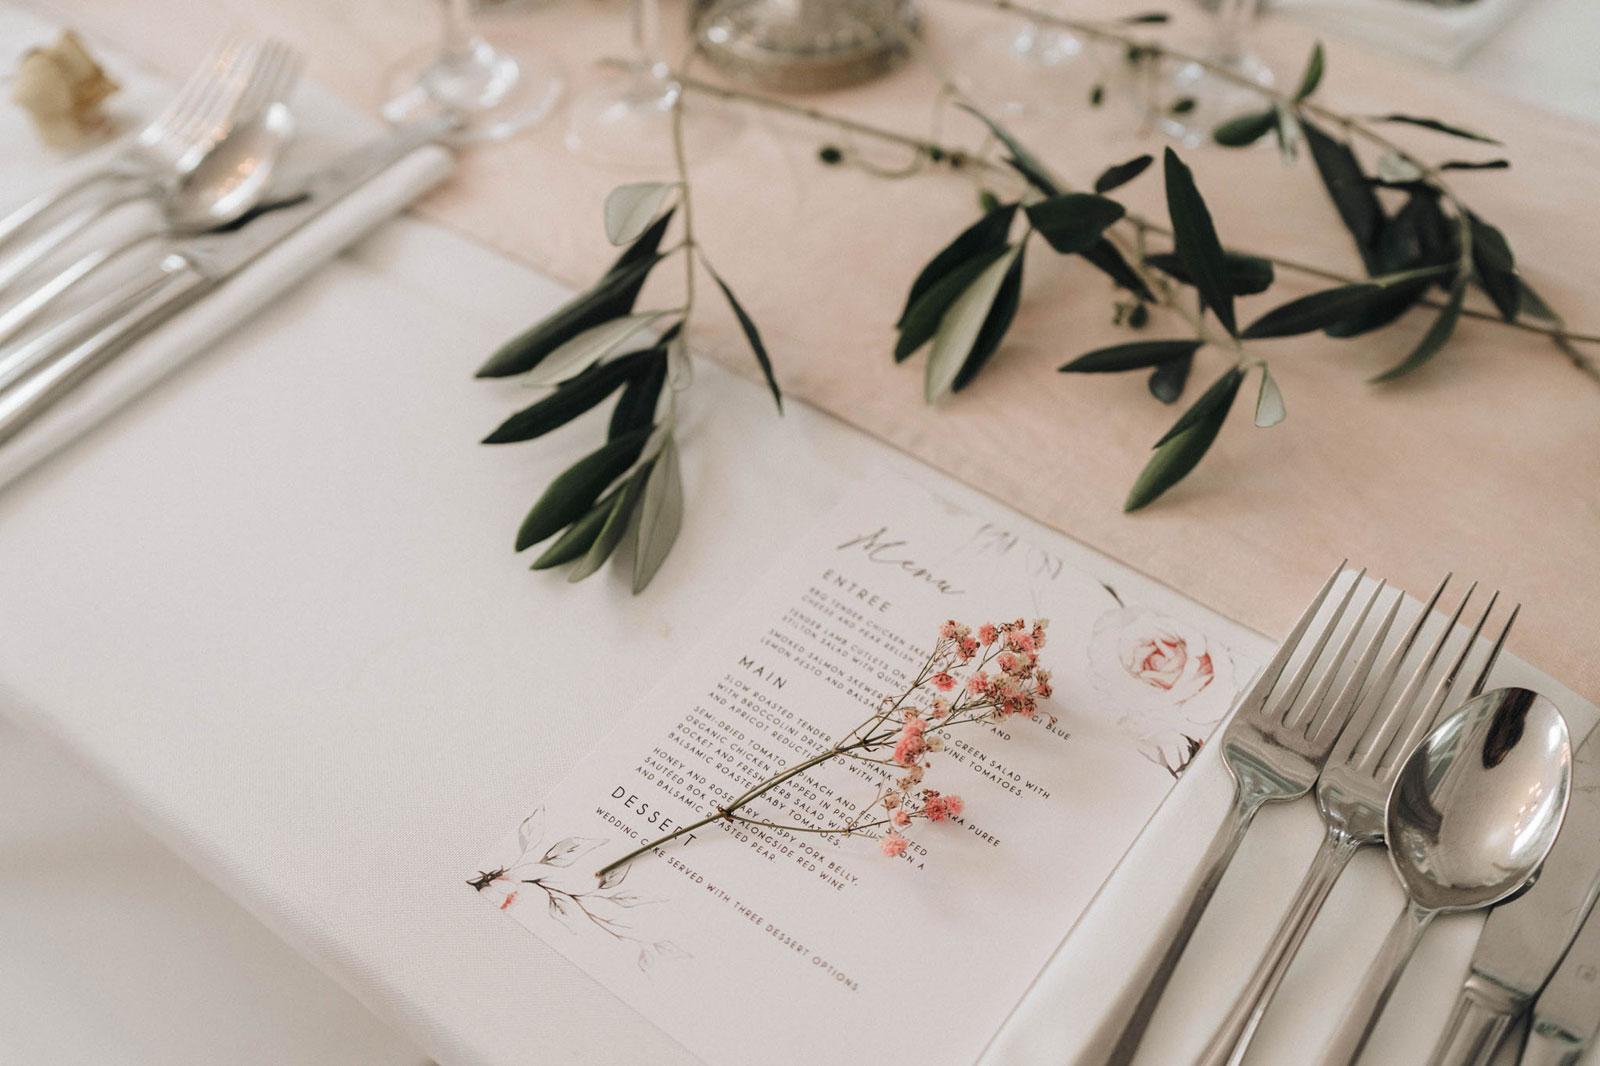 newfound-n-c-olive-tree-cottage-tauranga-wedding-photographer-922